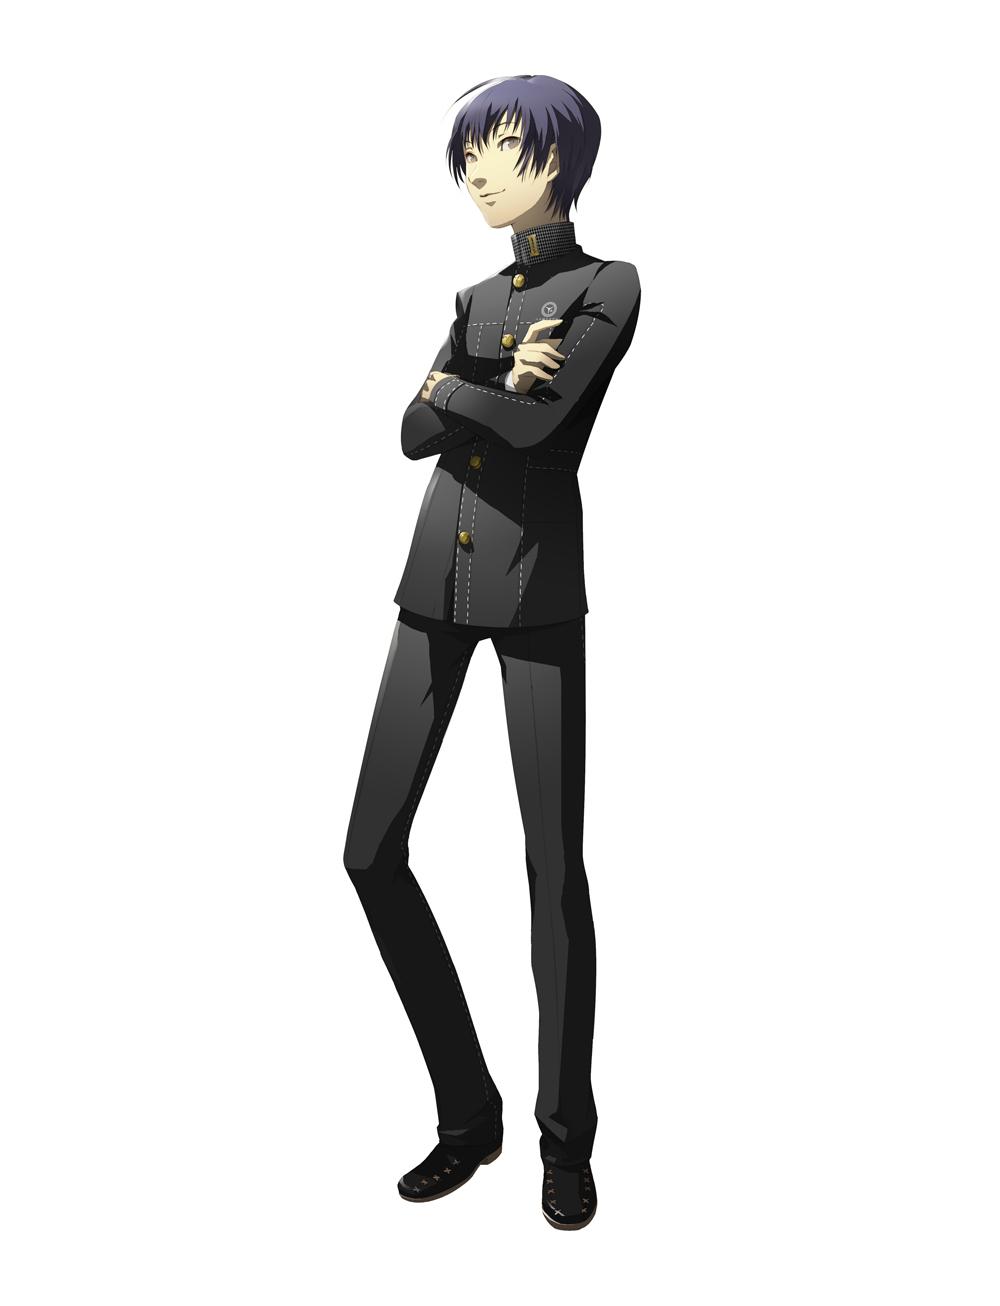 crossed_arms grey_eyes highres ichijou_kou jacket male official_art persona persona_4 shigenori_soejima short_hair soejima_shigenori